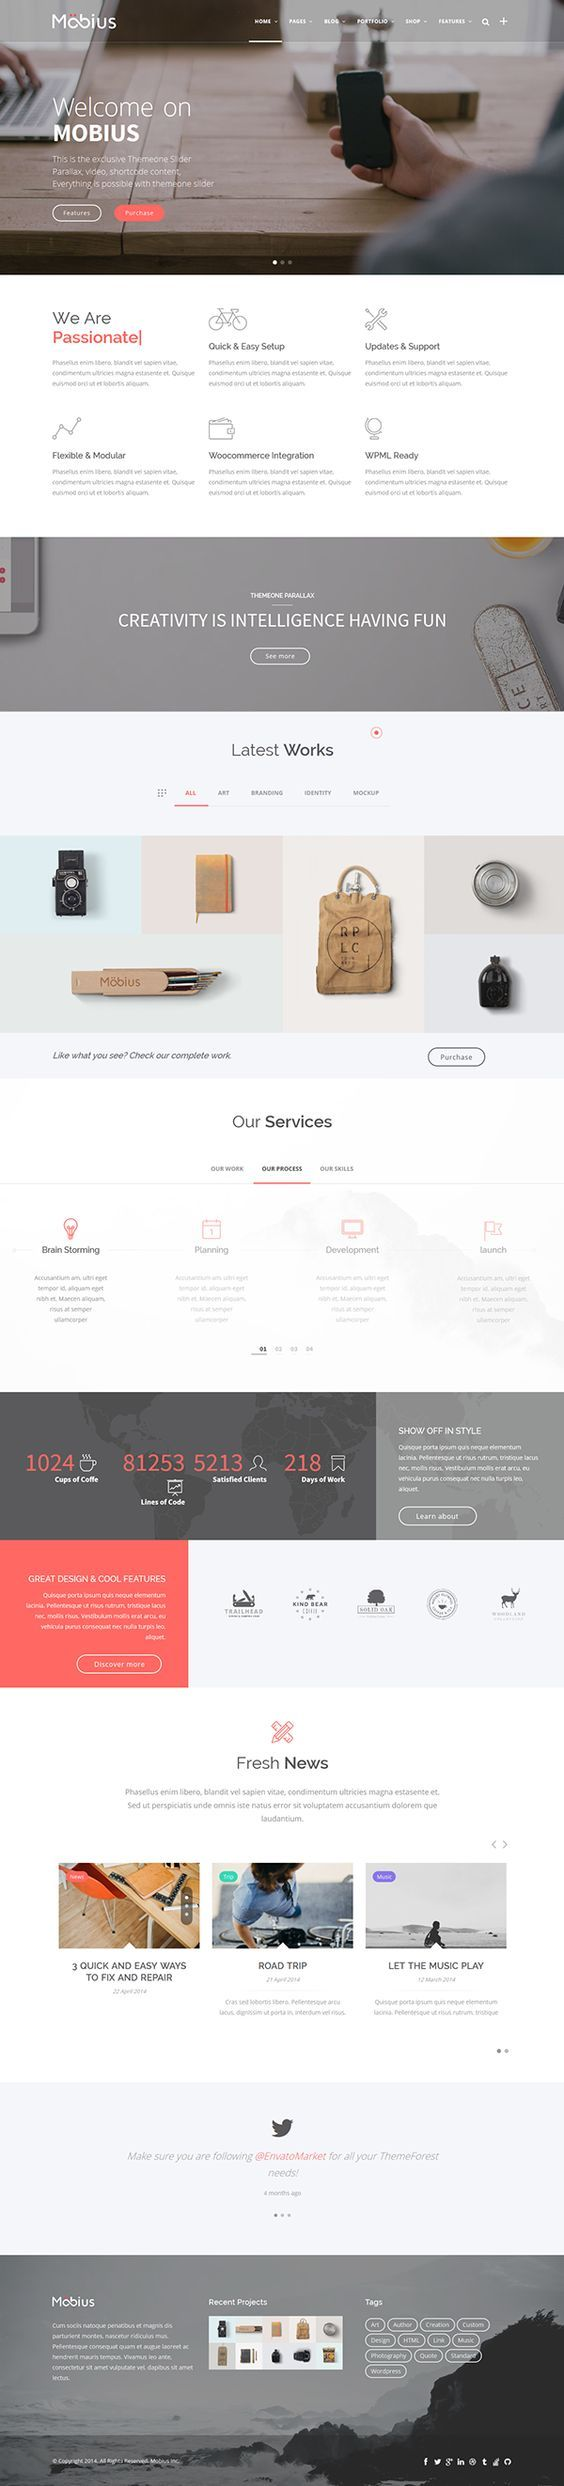 Mobius - Responsive Multi-Purpose WordPress Theme on Web Design Served: